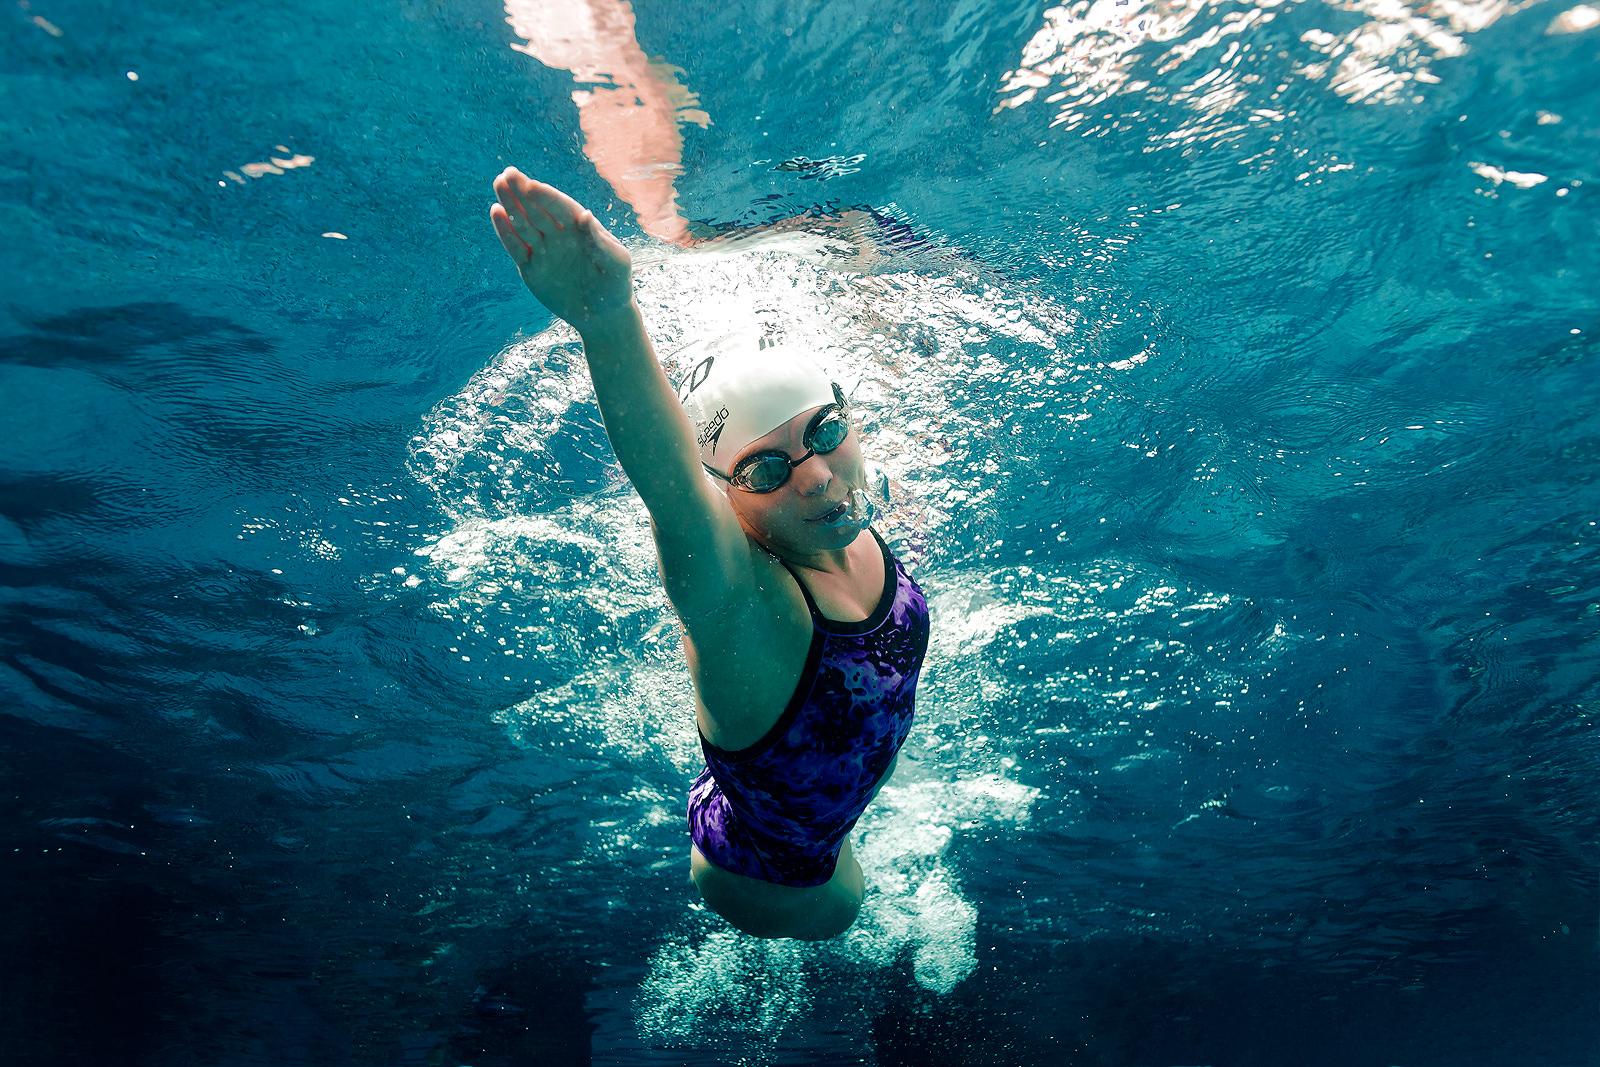 marcosvaldés FOTÓGRAFO® unserwater and athletes photographer